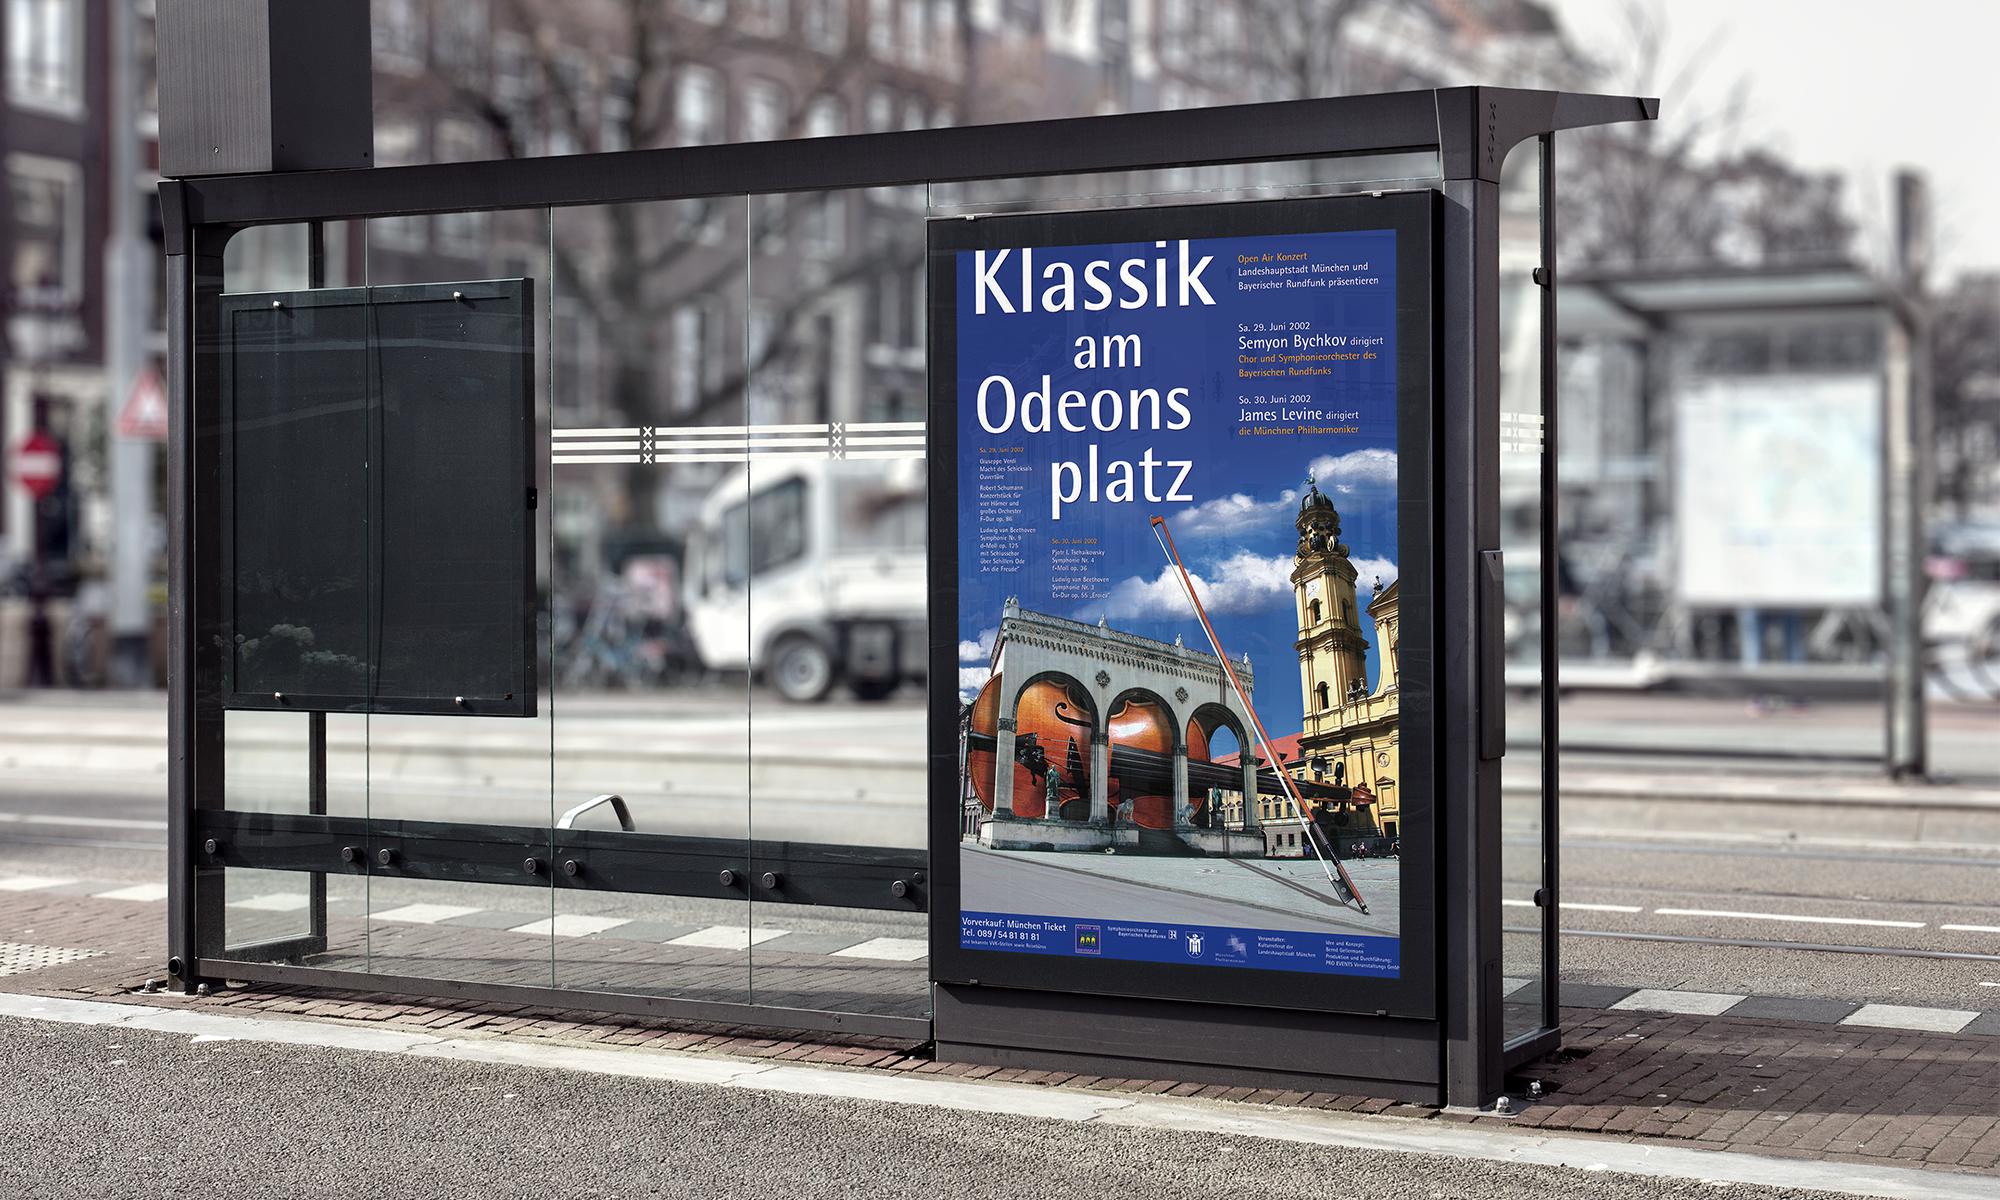 Werbung Klassik am Odeonsplatz